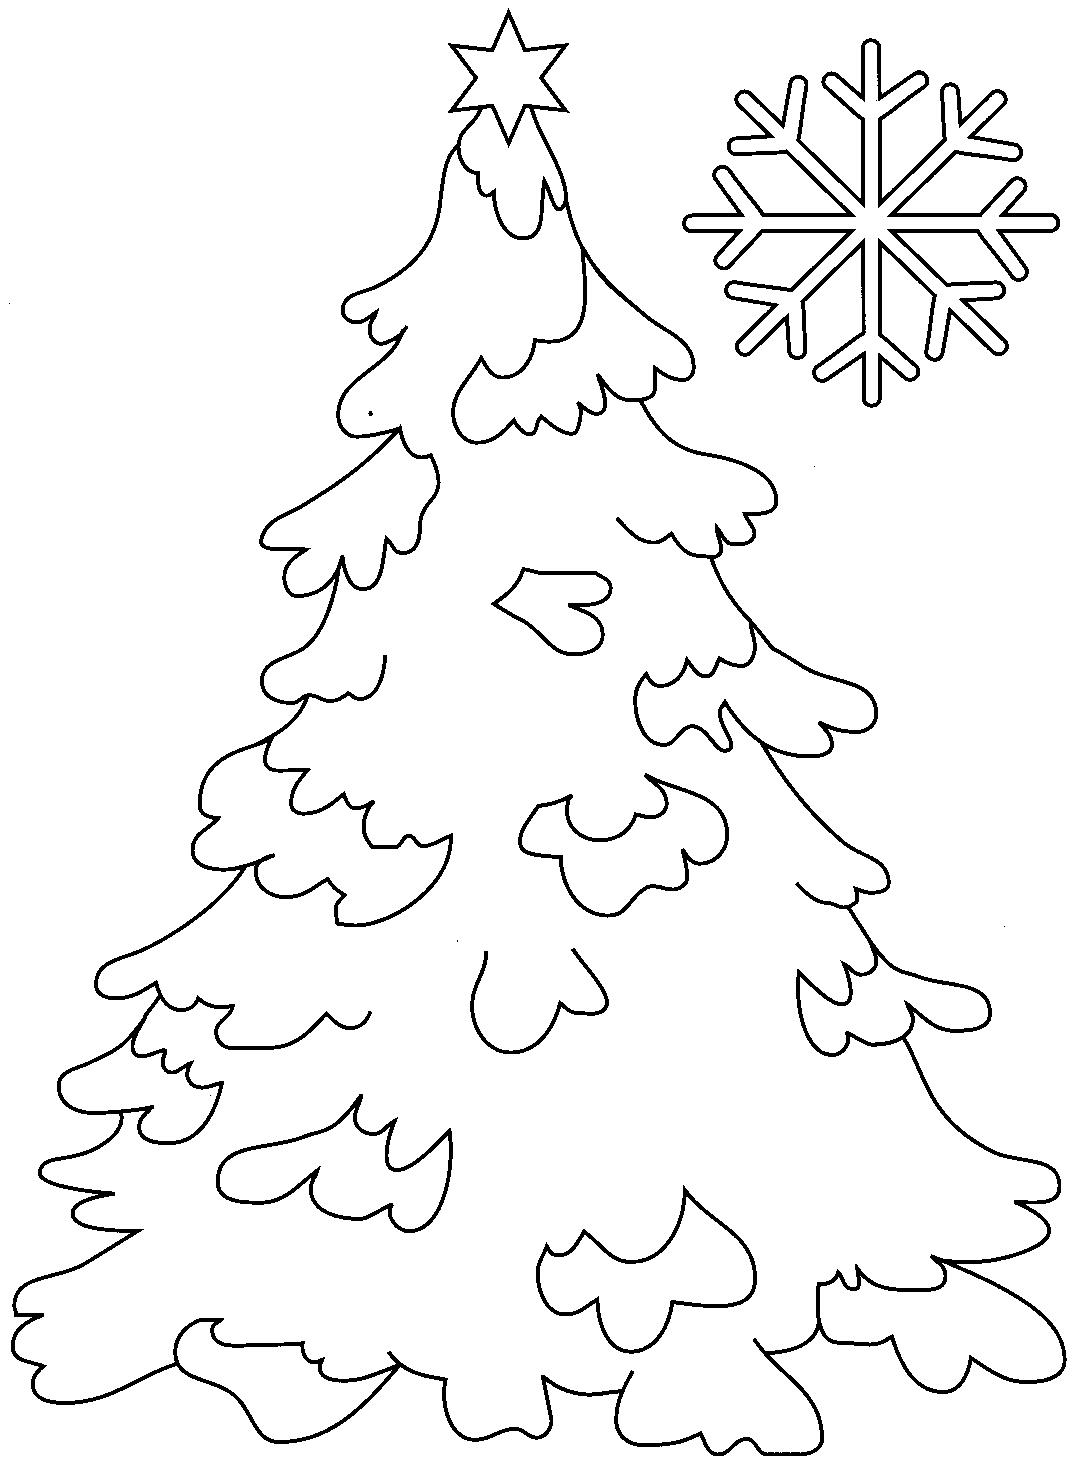 Window color weihnachten vorlagen - Dibujos para colorear